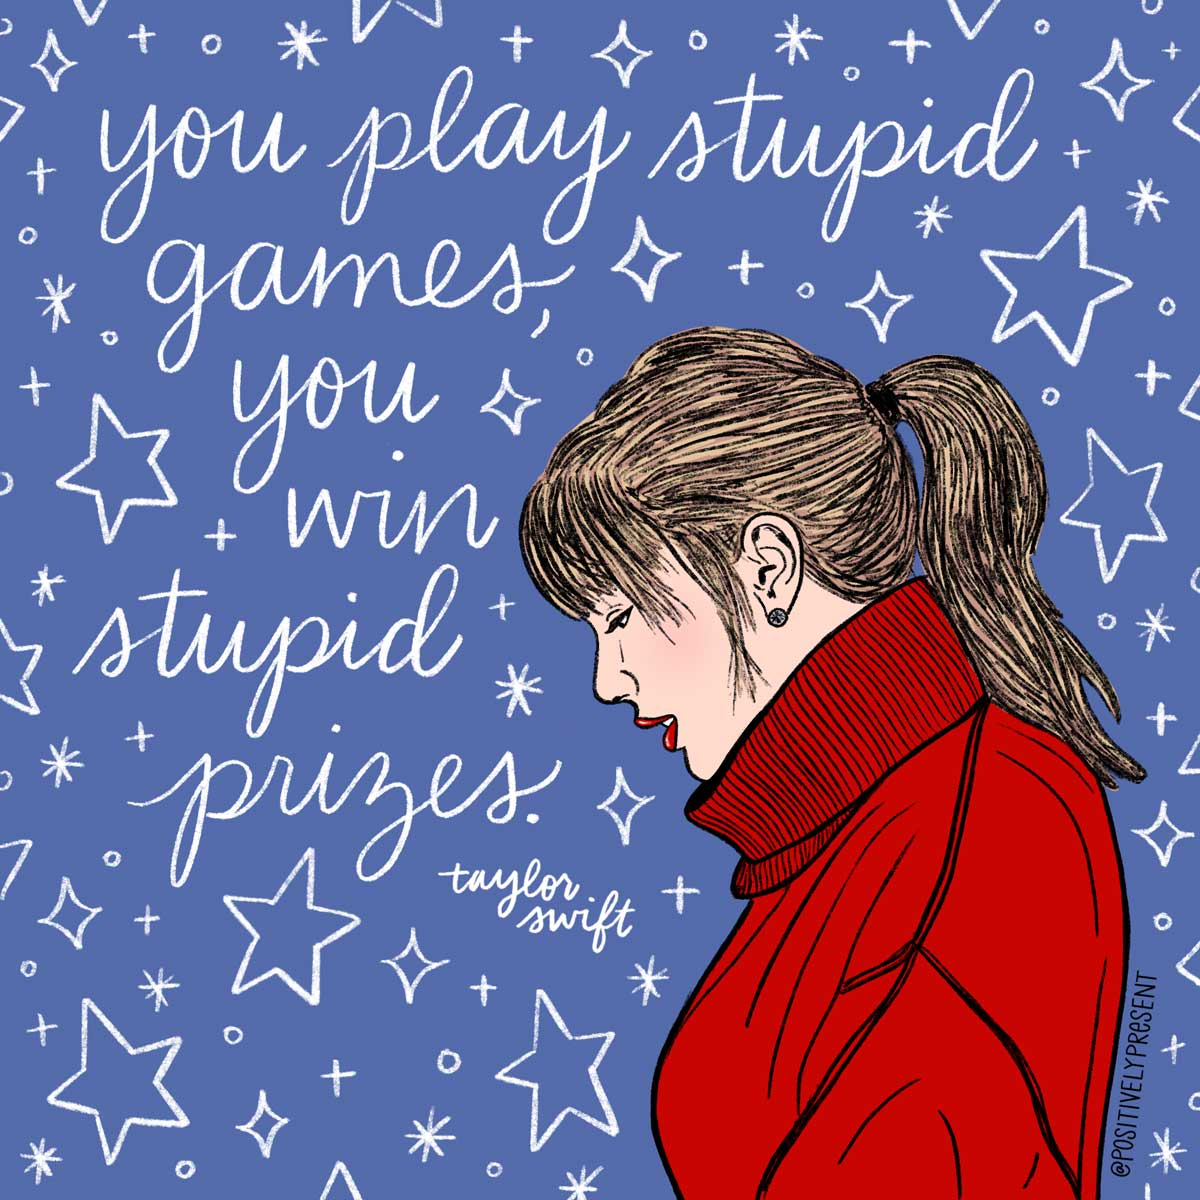 You play stupid games, you win stupid prizes taylor swift lyrics.